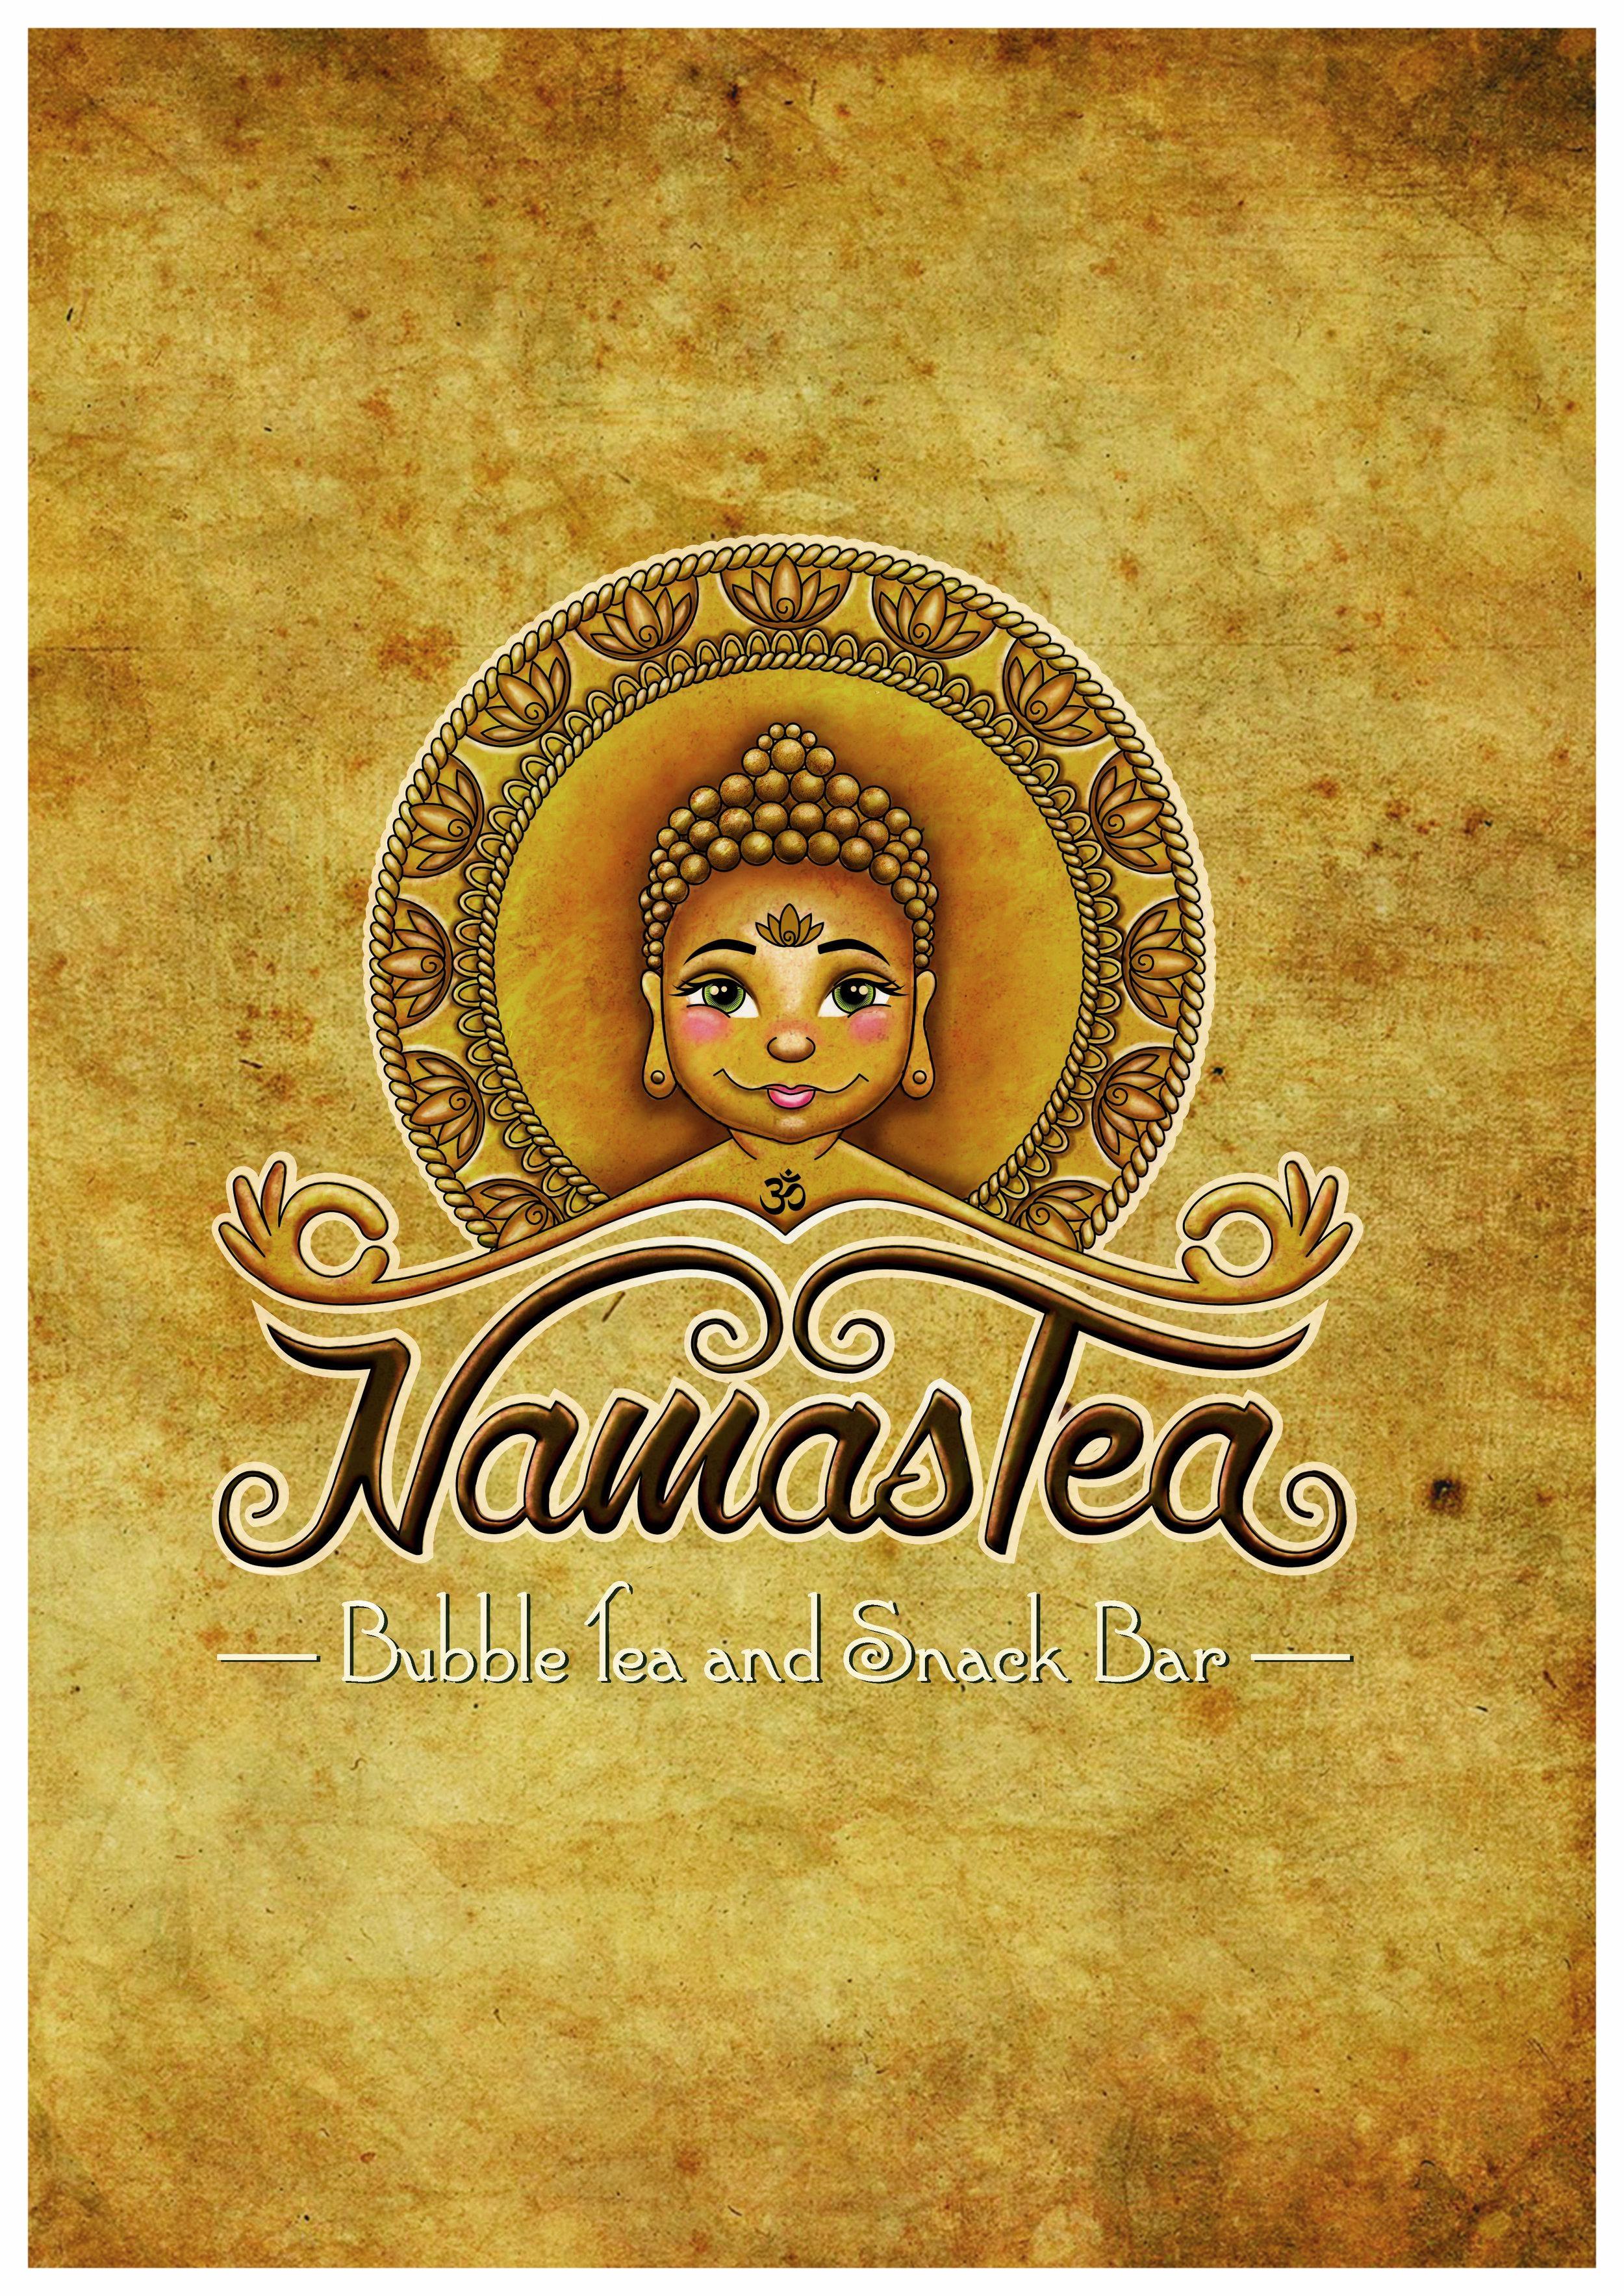 namastea_logo_final.jpg